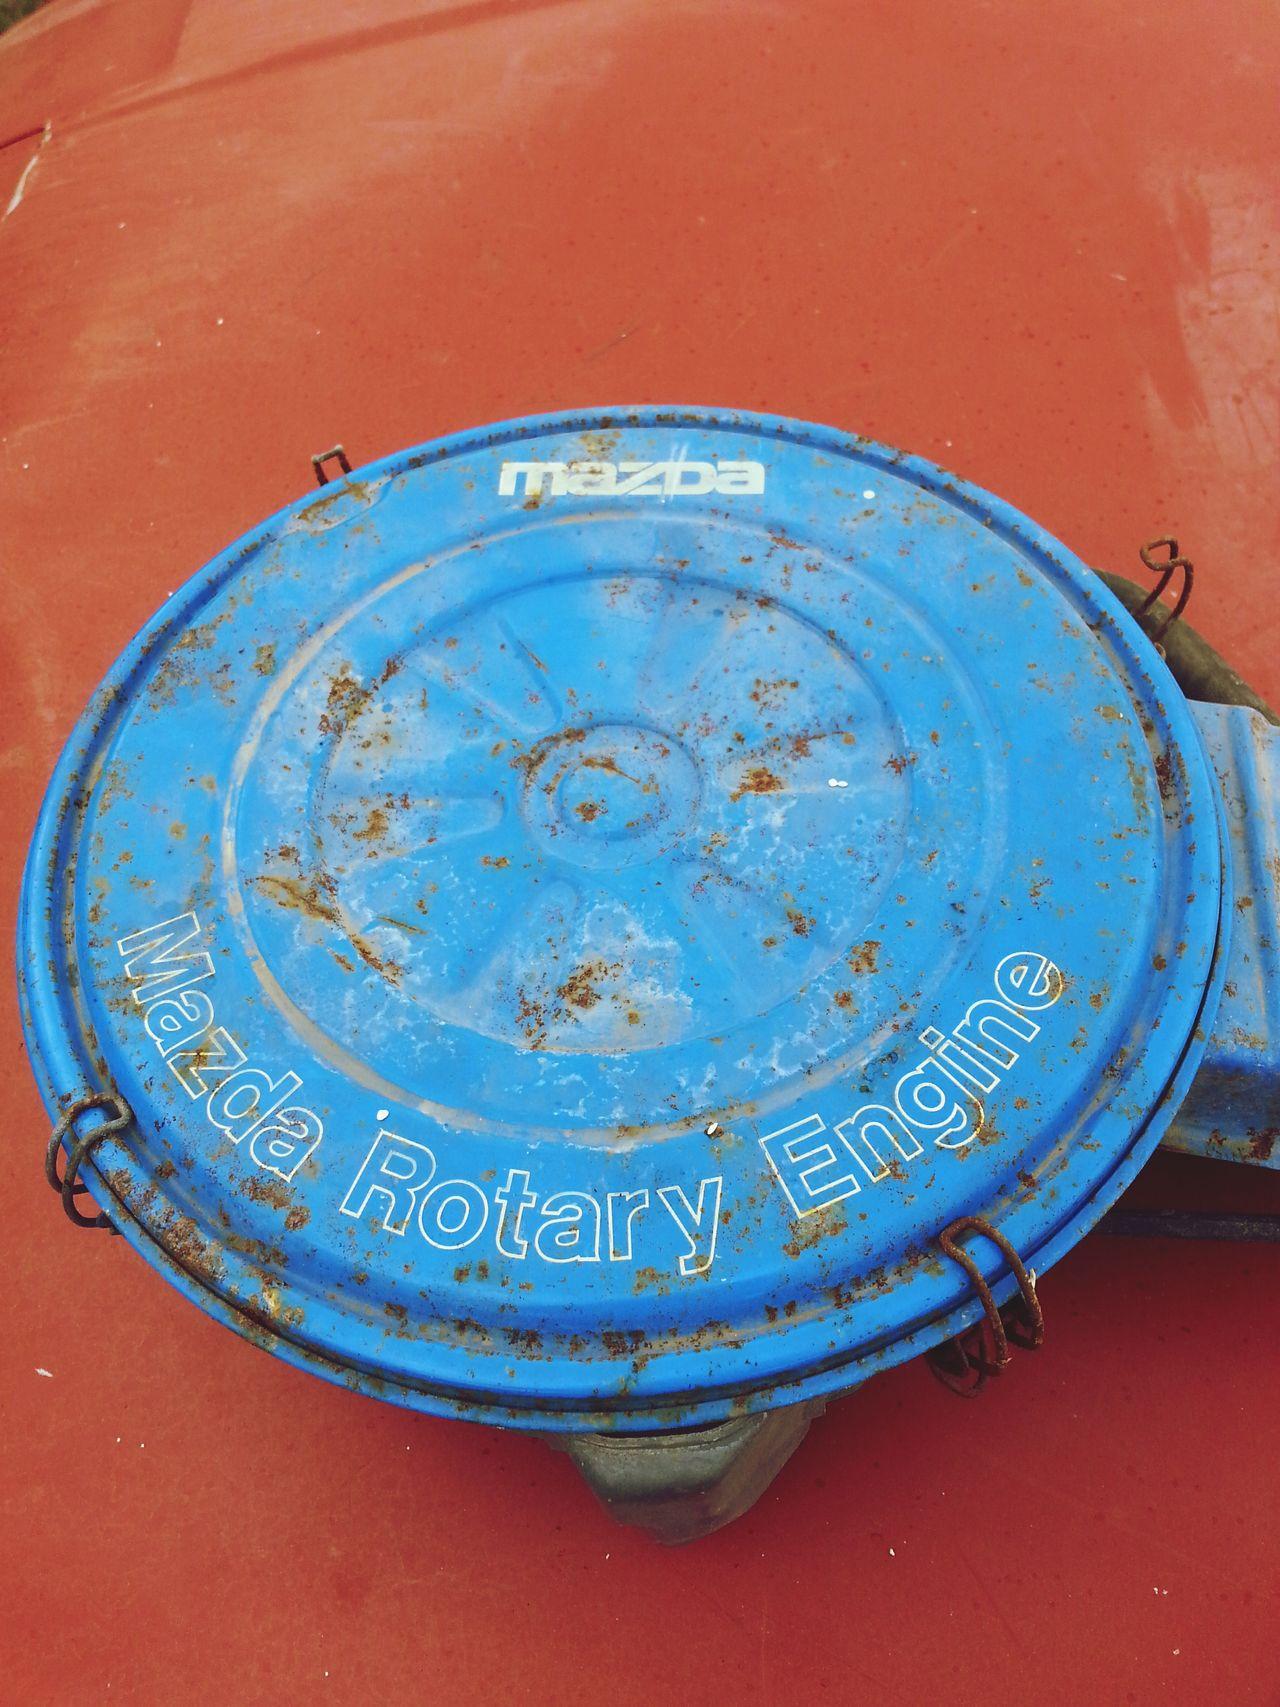 Close-up Outdoors Retro Car Parts Carporn Air Breather Blue Rotary Engine Mazda